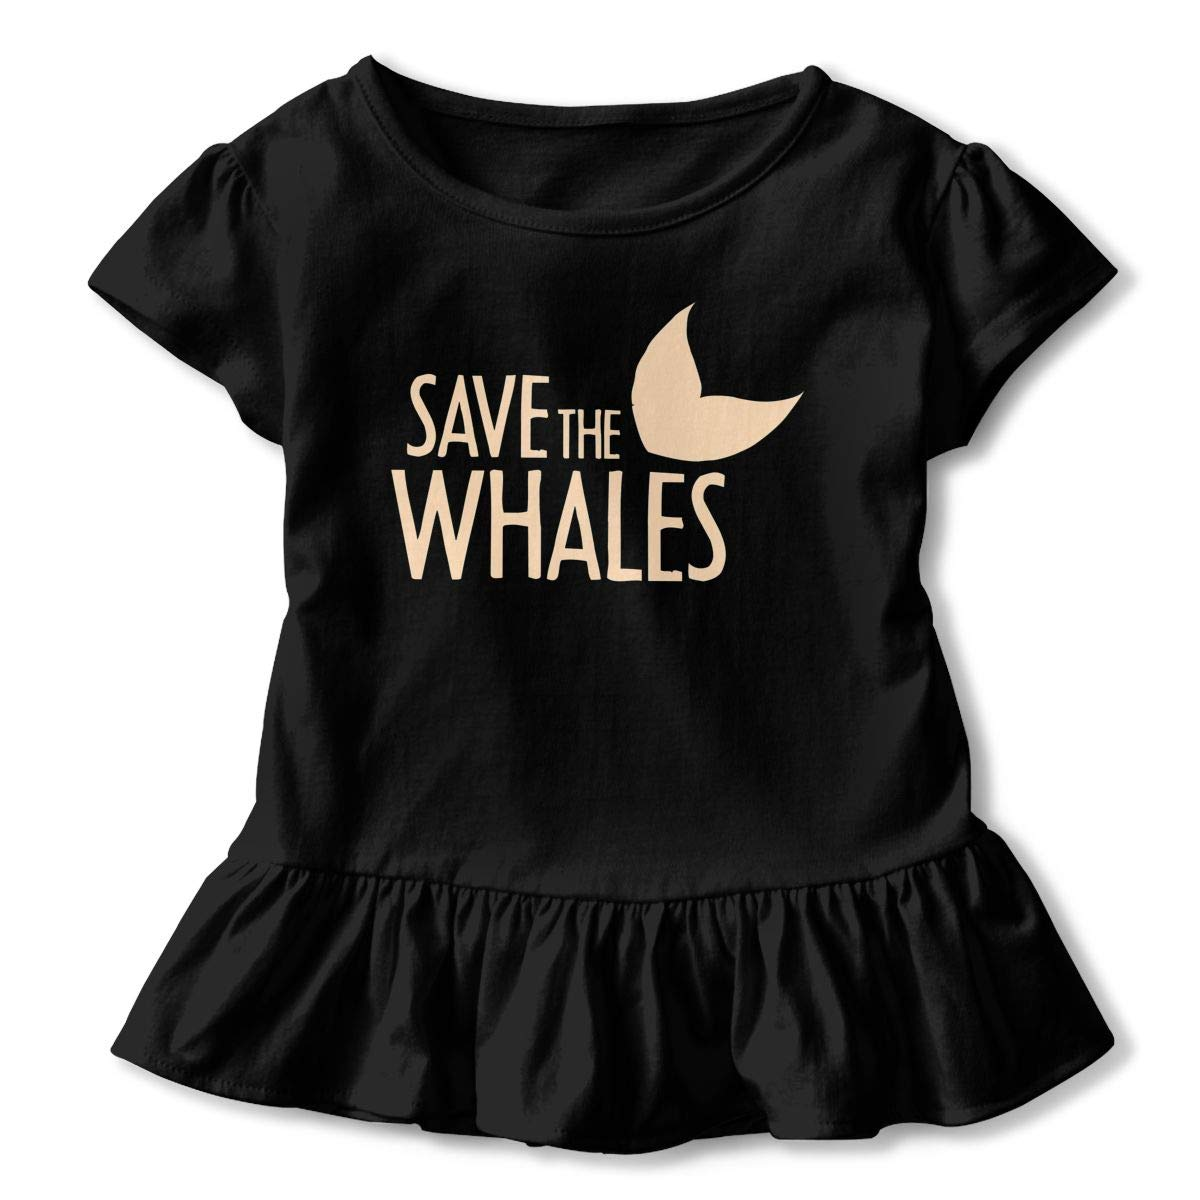 NMDJC CCQ Save The Whales Baby Skirts Fashion Kids T Shirt Dress Cotton Flounces Skort